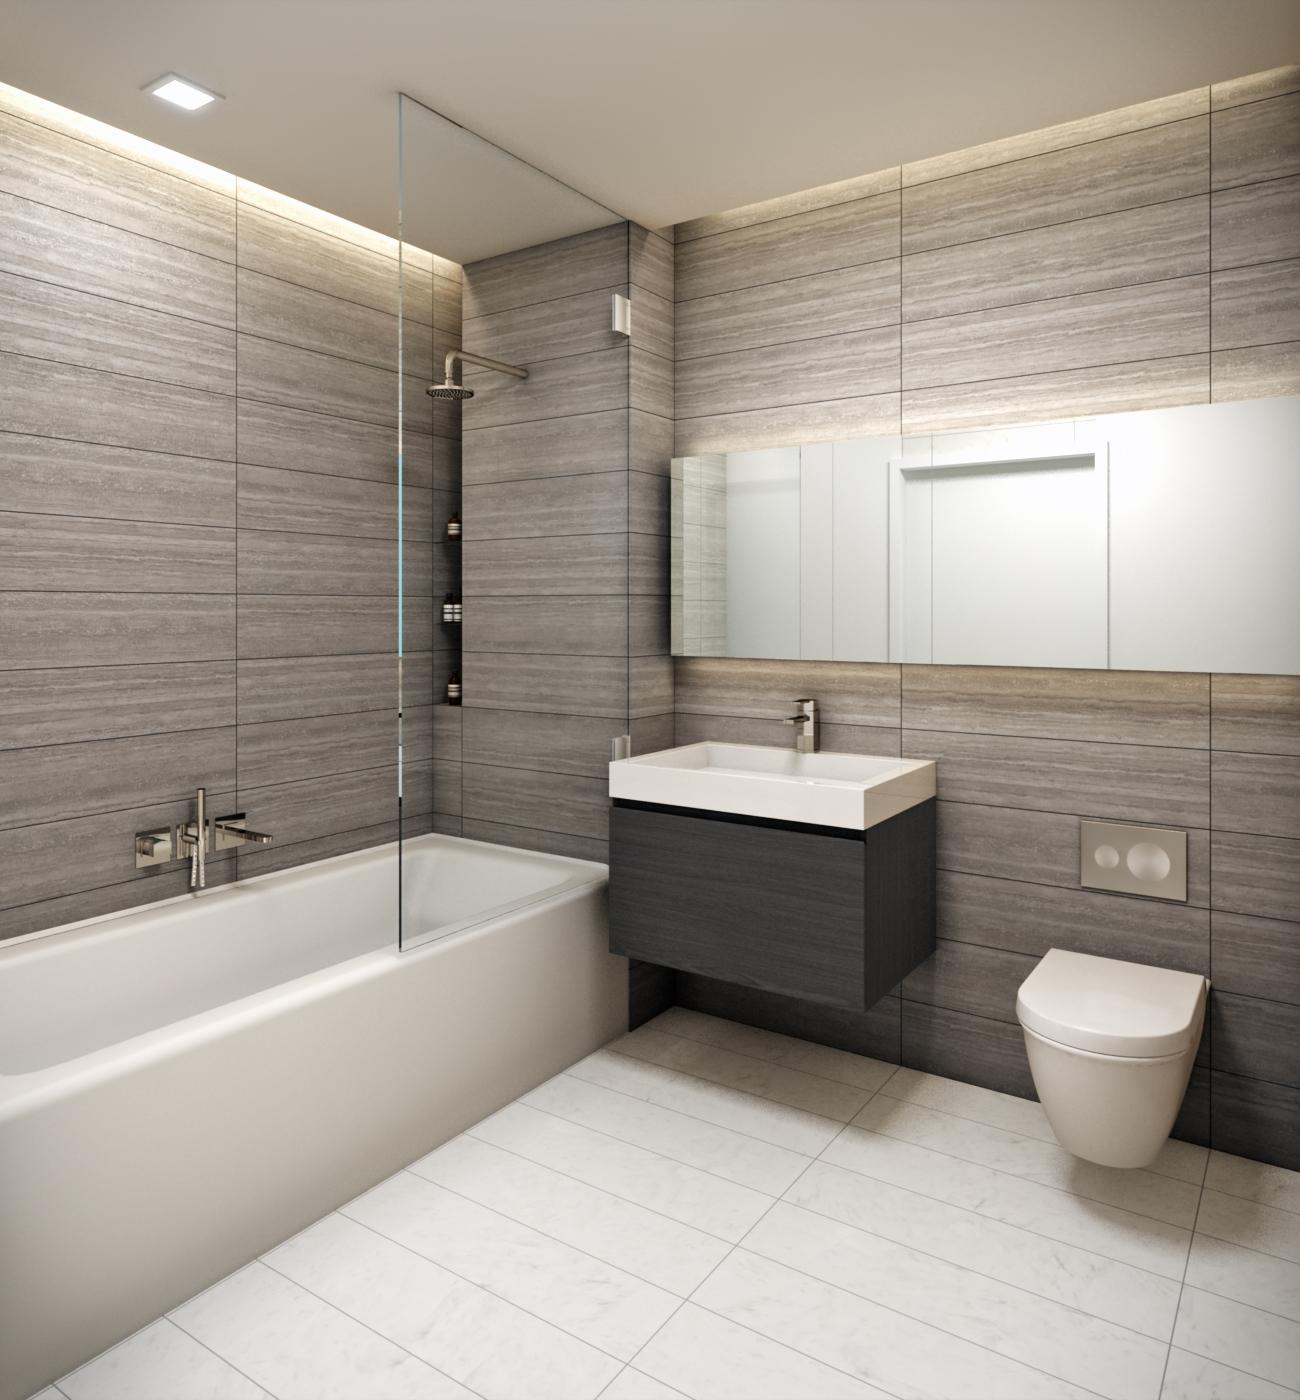 10 Greene Secondary Bath opt1.jpg